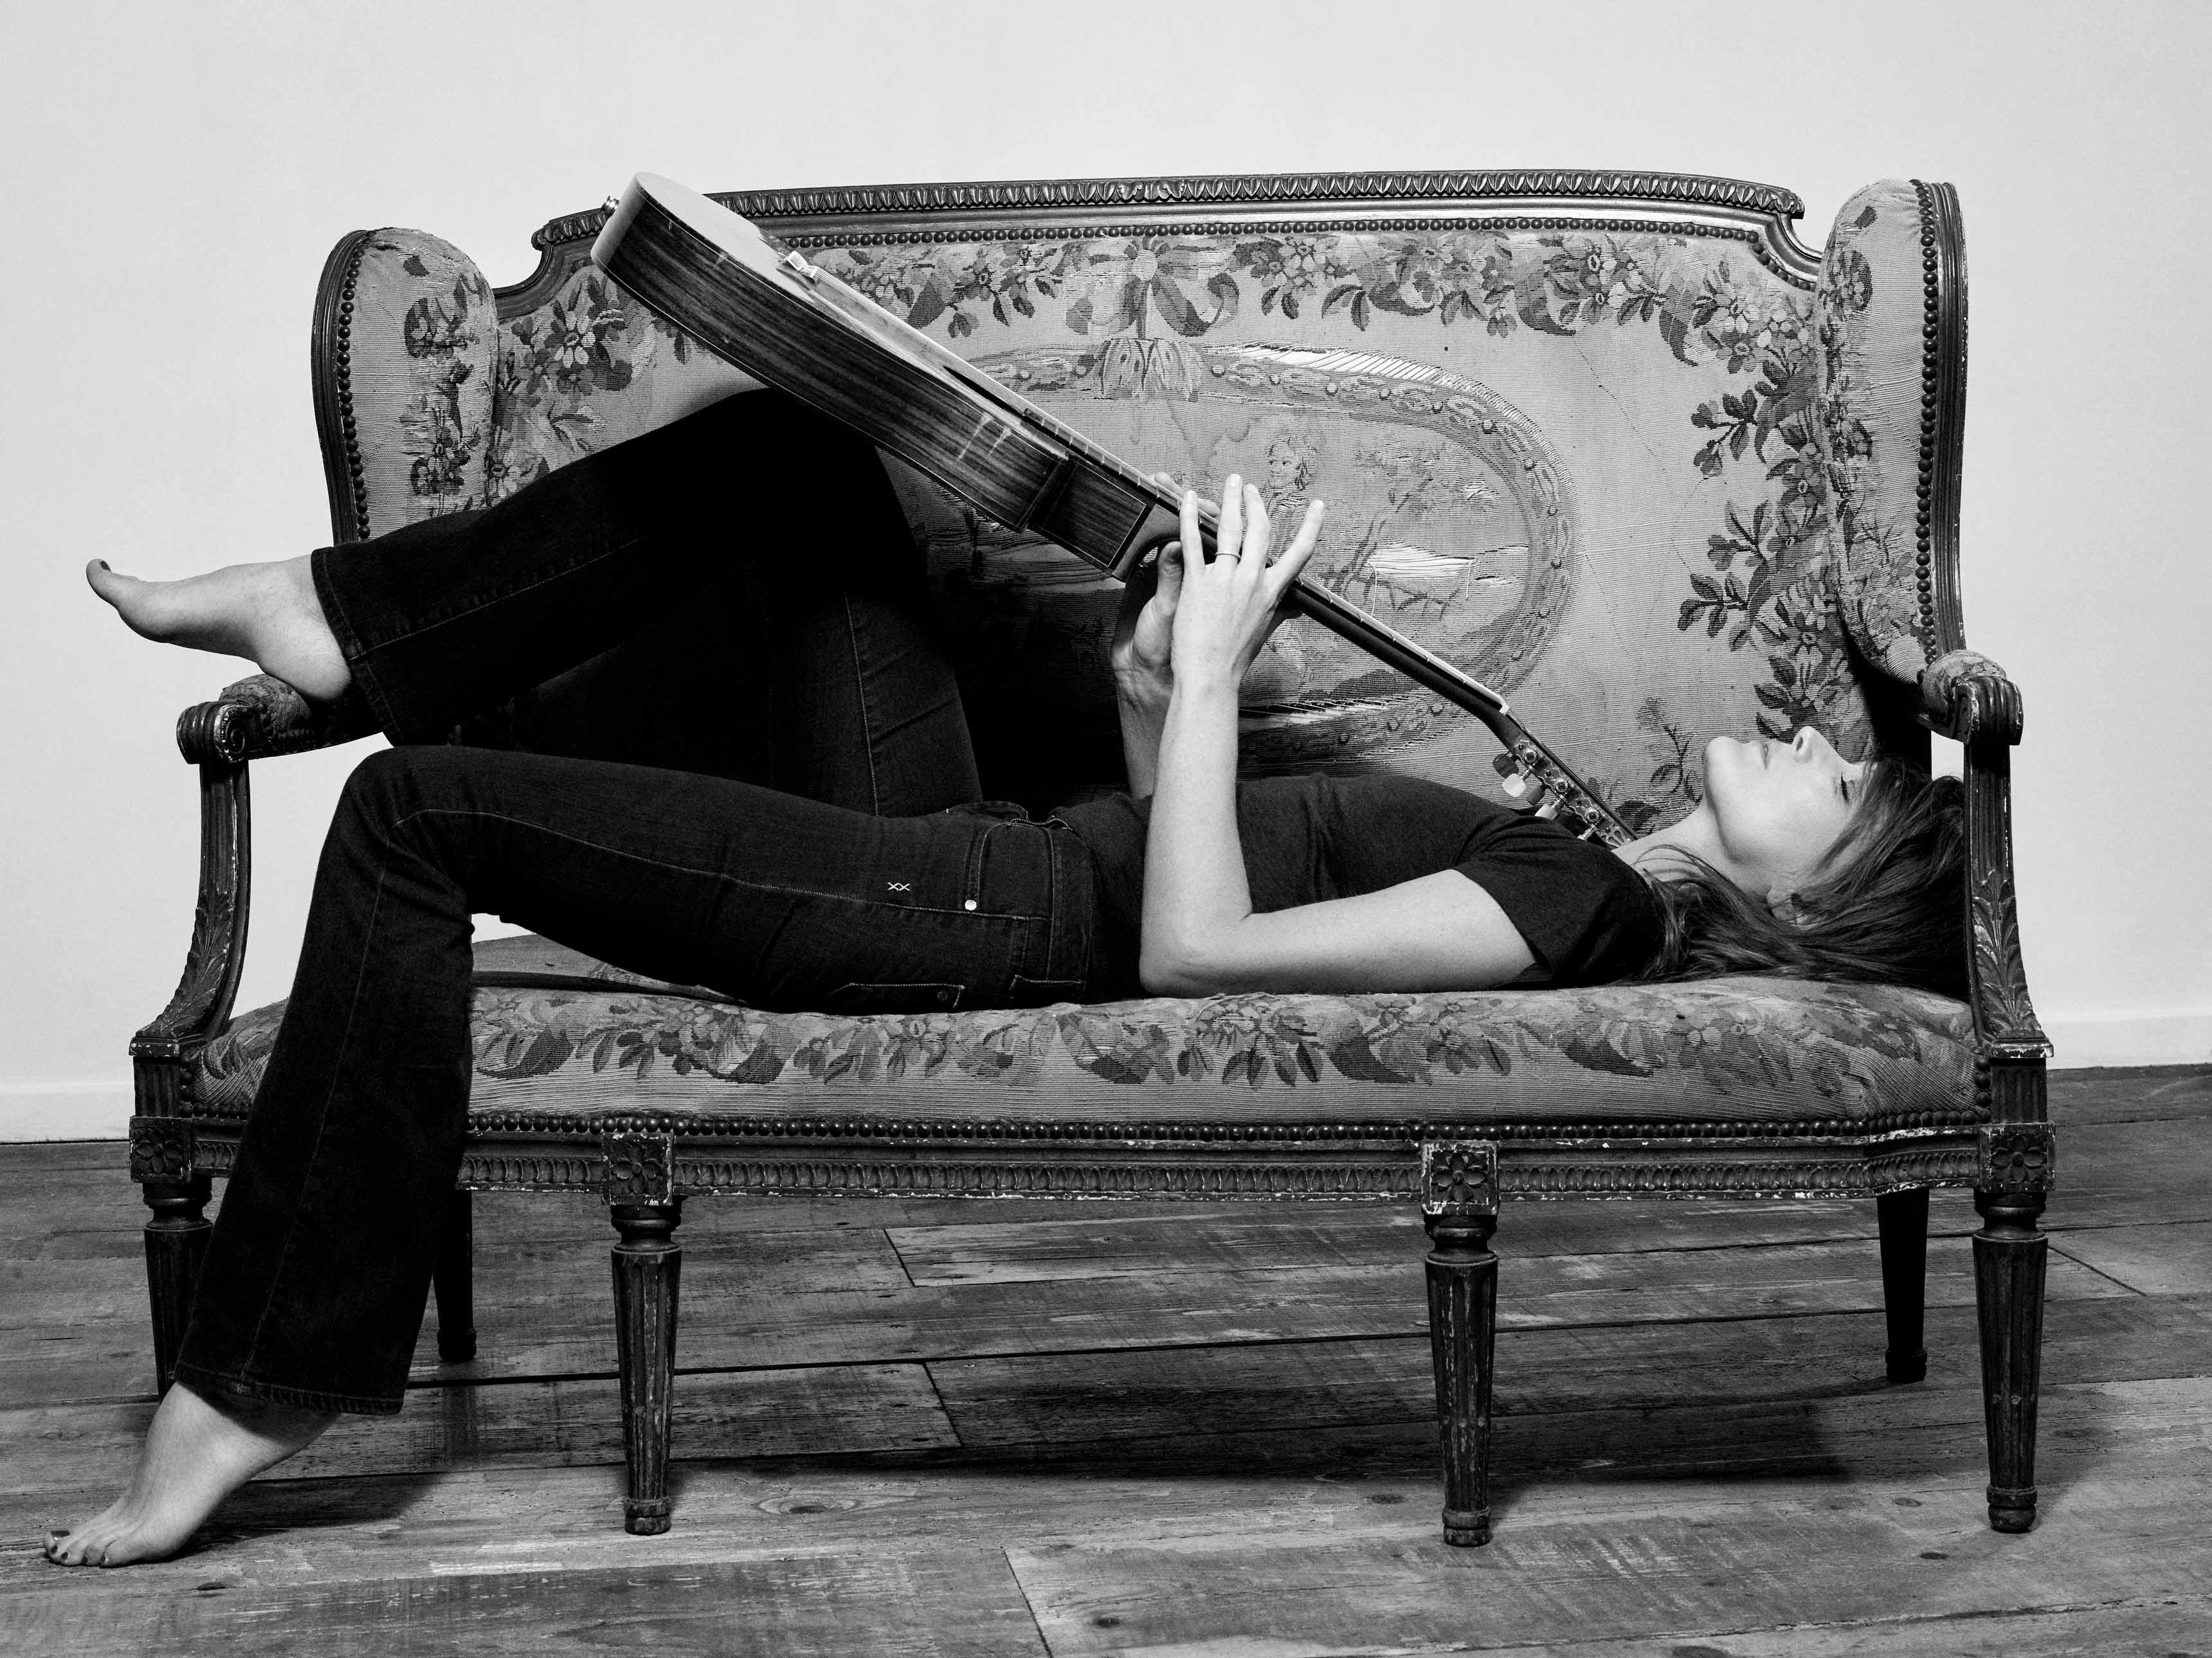 Photos par Yann Orhan/Slo Slo. Coiffure : Paolo Ferreira. Maquillage : Mayia Alleaume. Production : Clotilde Lecuillier